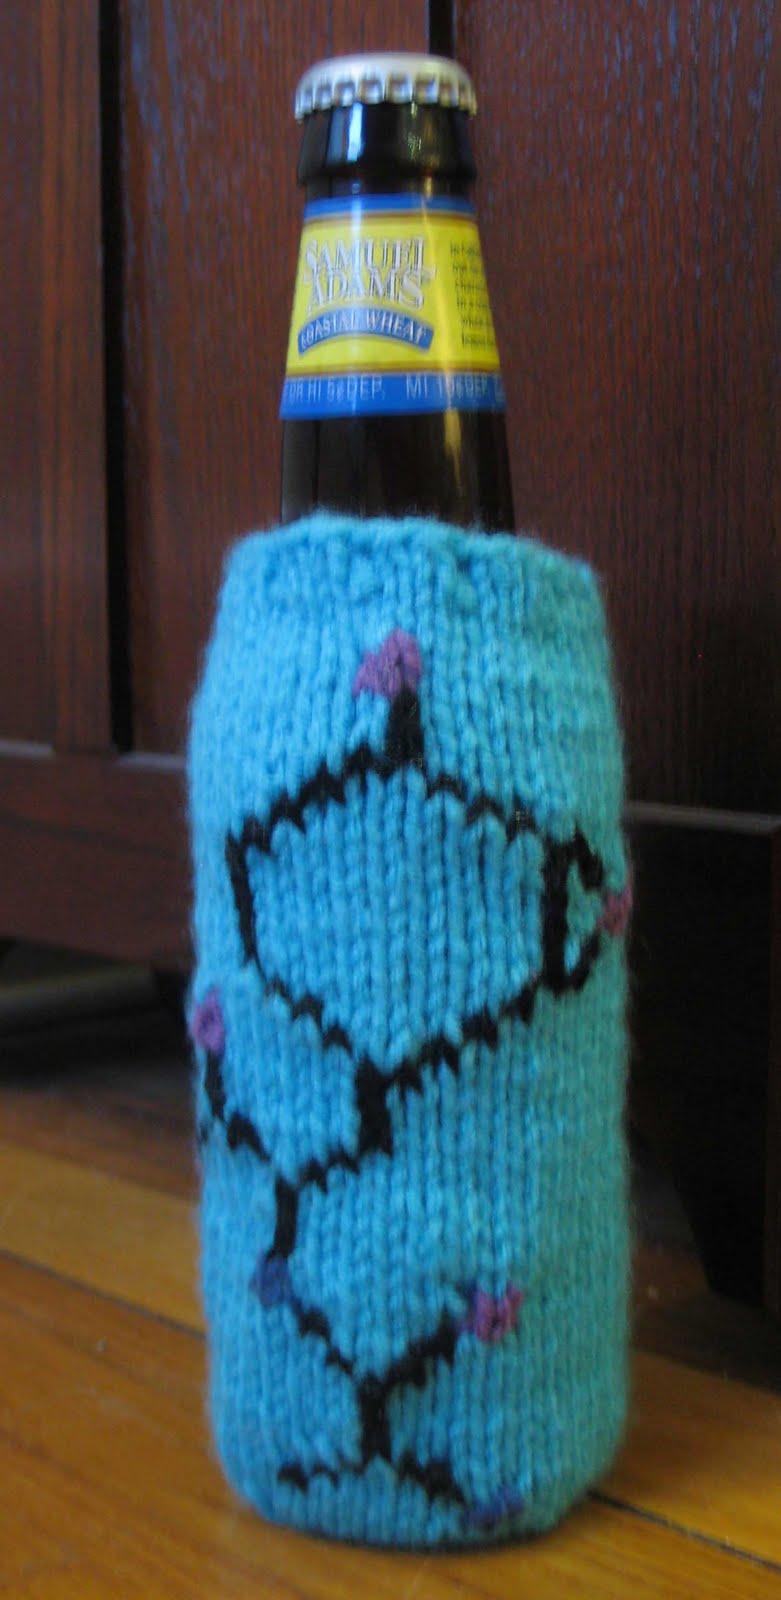 ChemKnits: Bacilysin Beer Cozy Knitting Pattern